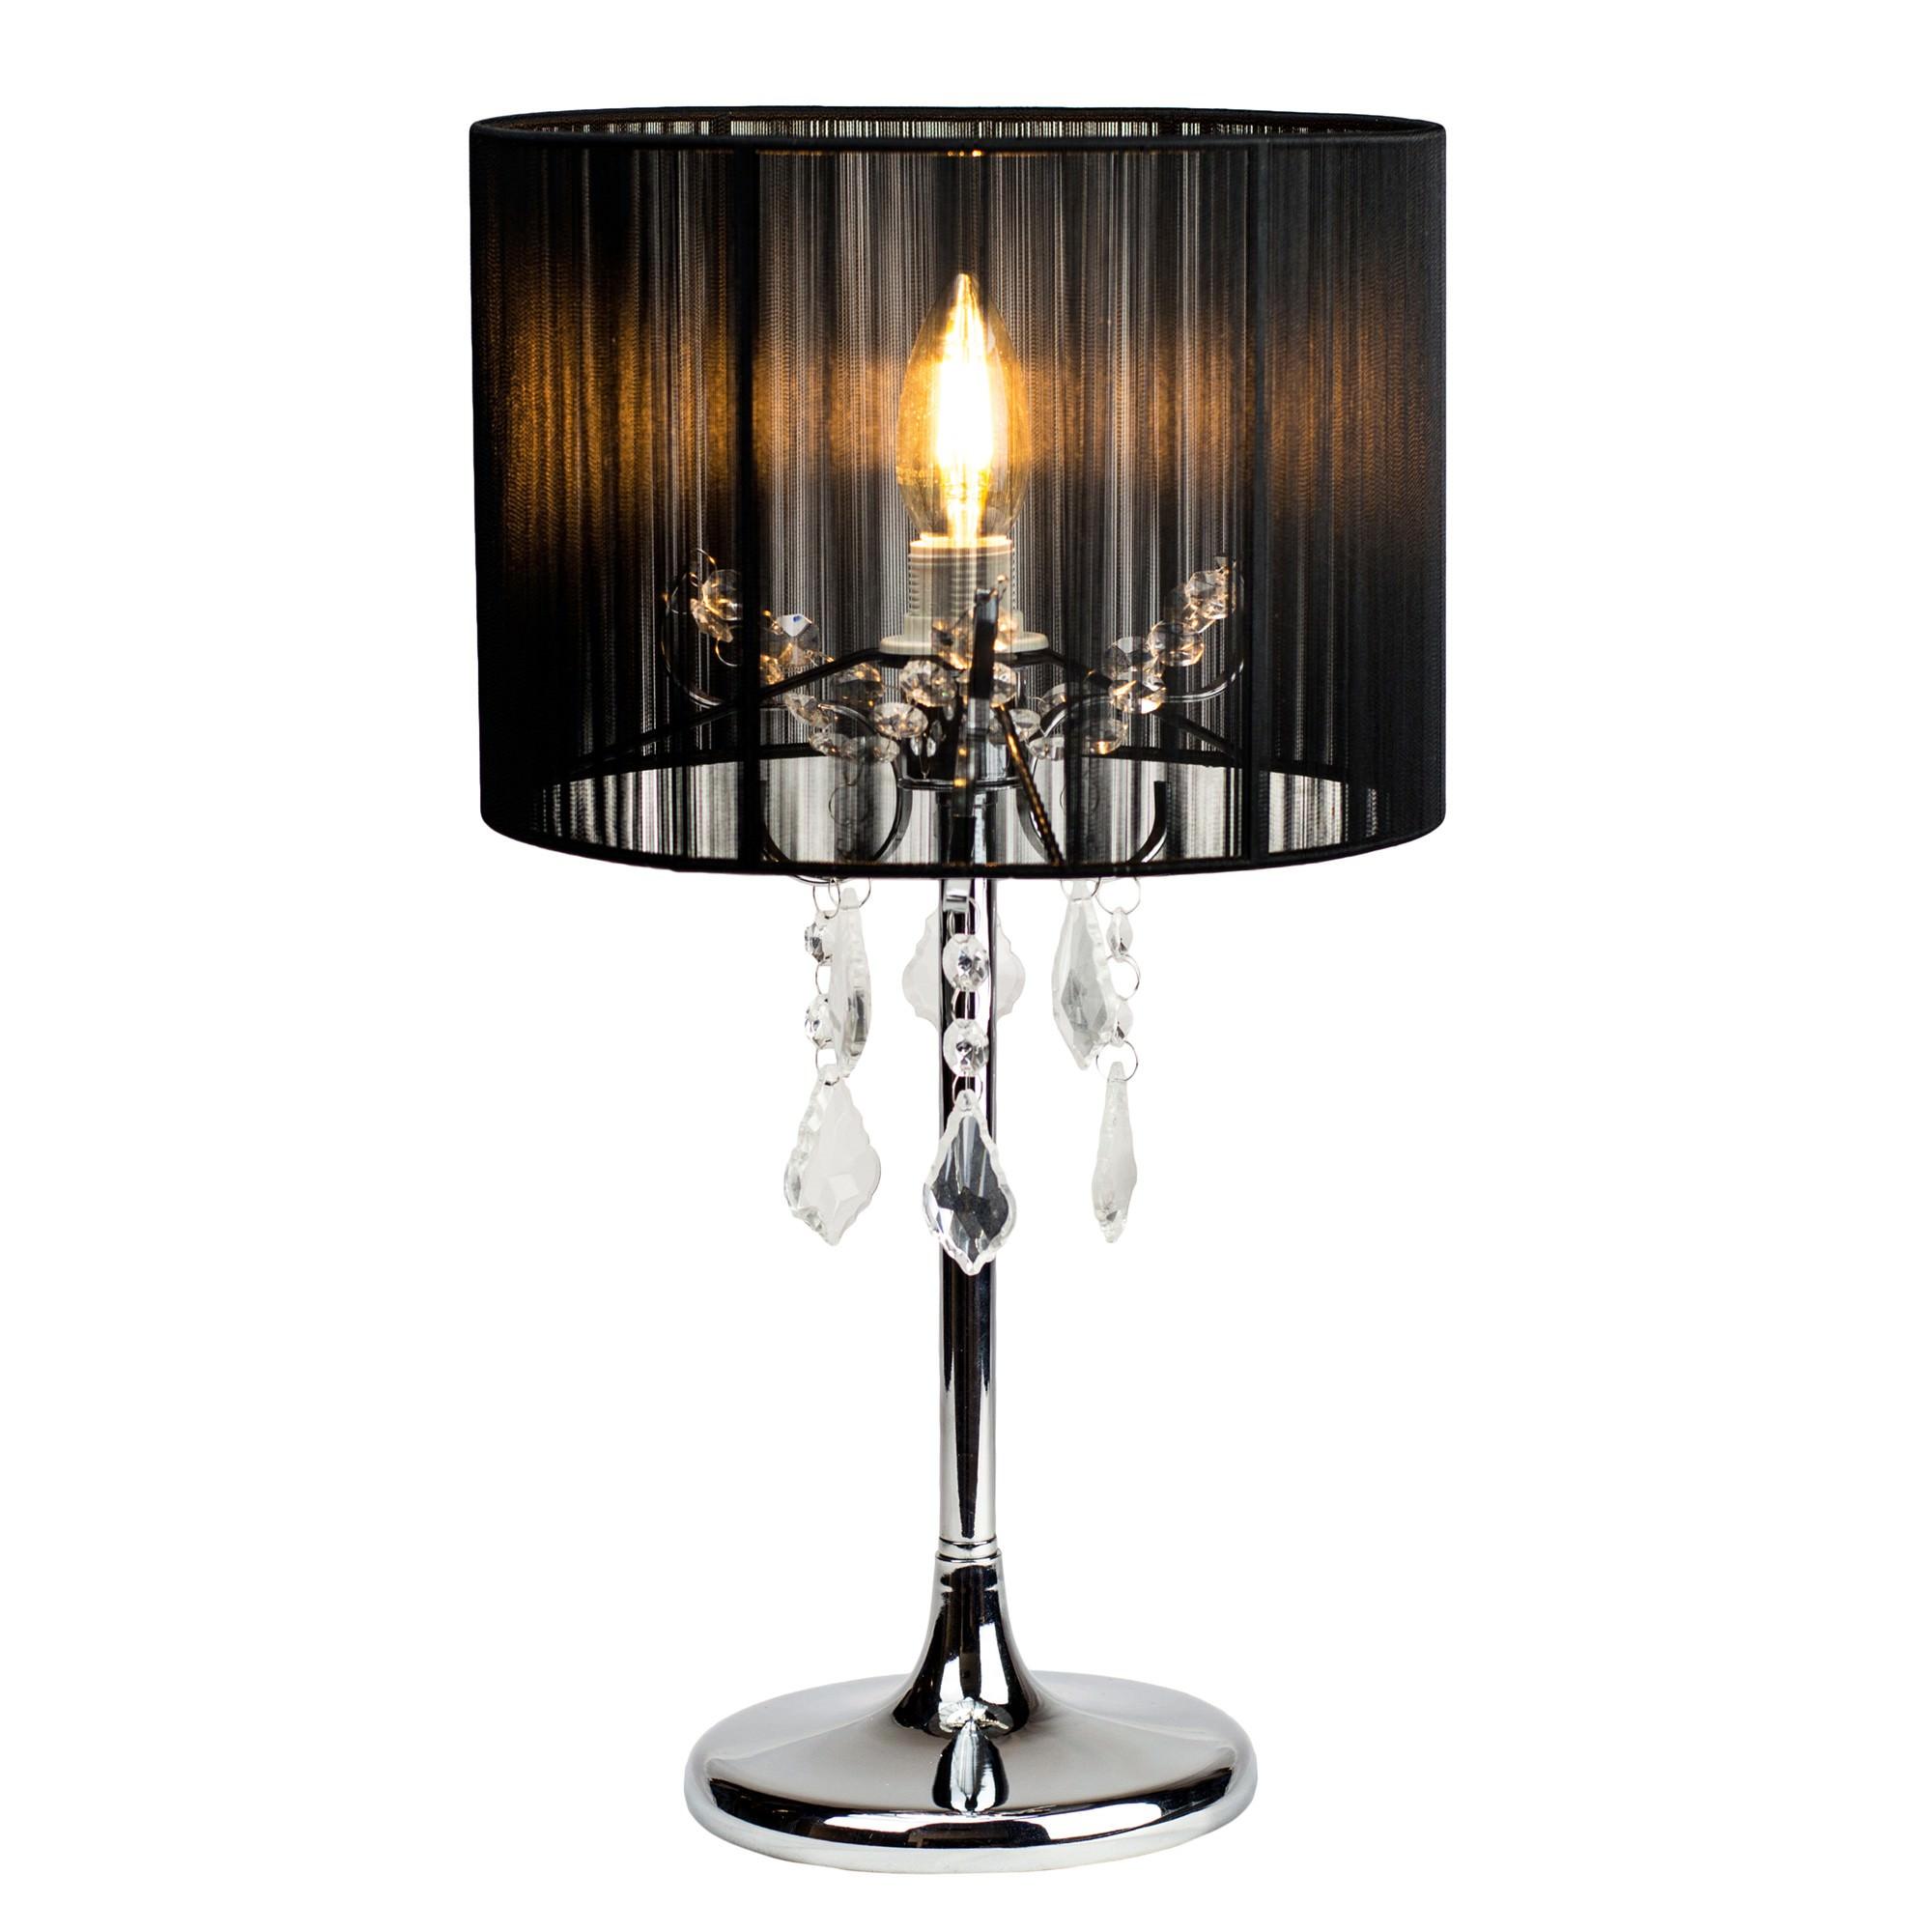 Paris Crystal Table Lamp, Black